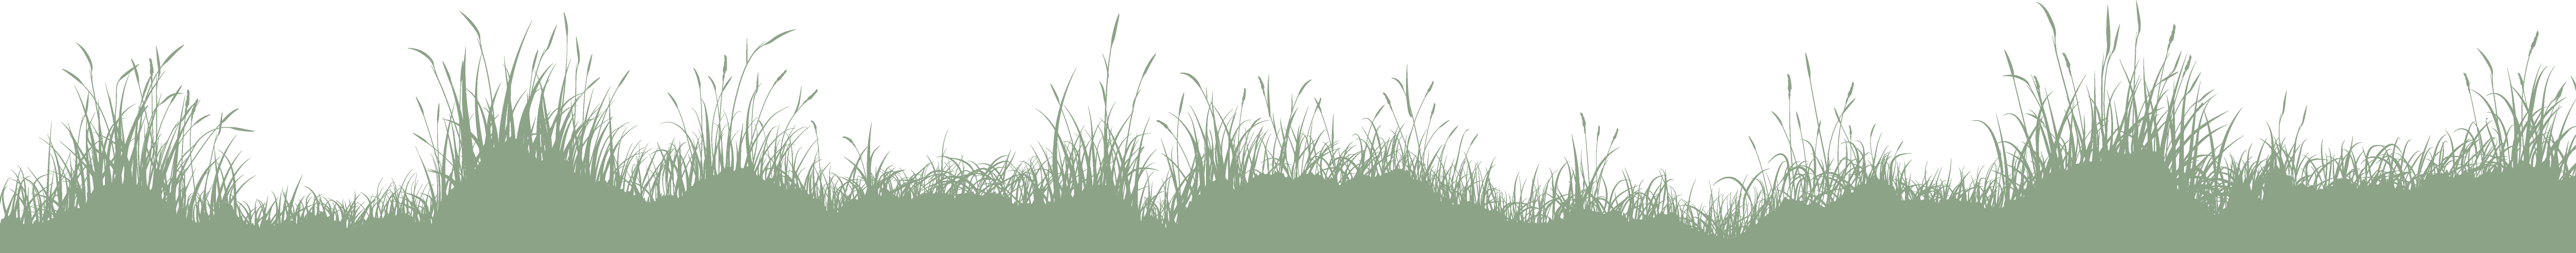 gras-lang-hintergrund